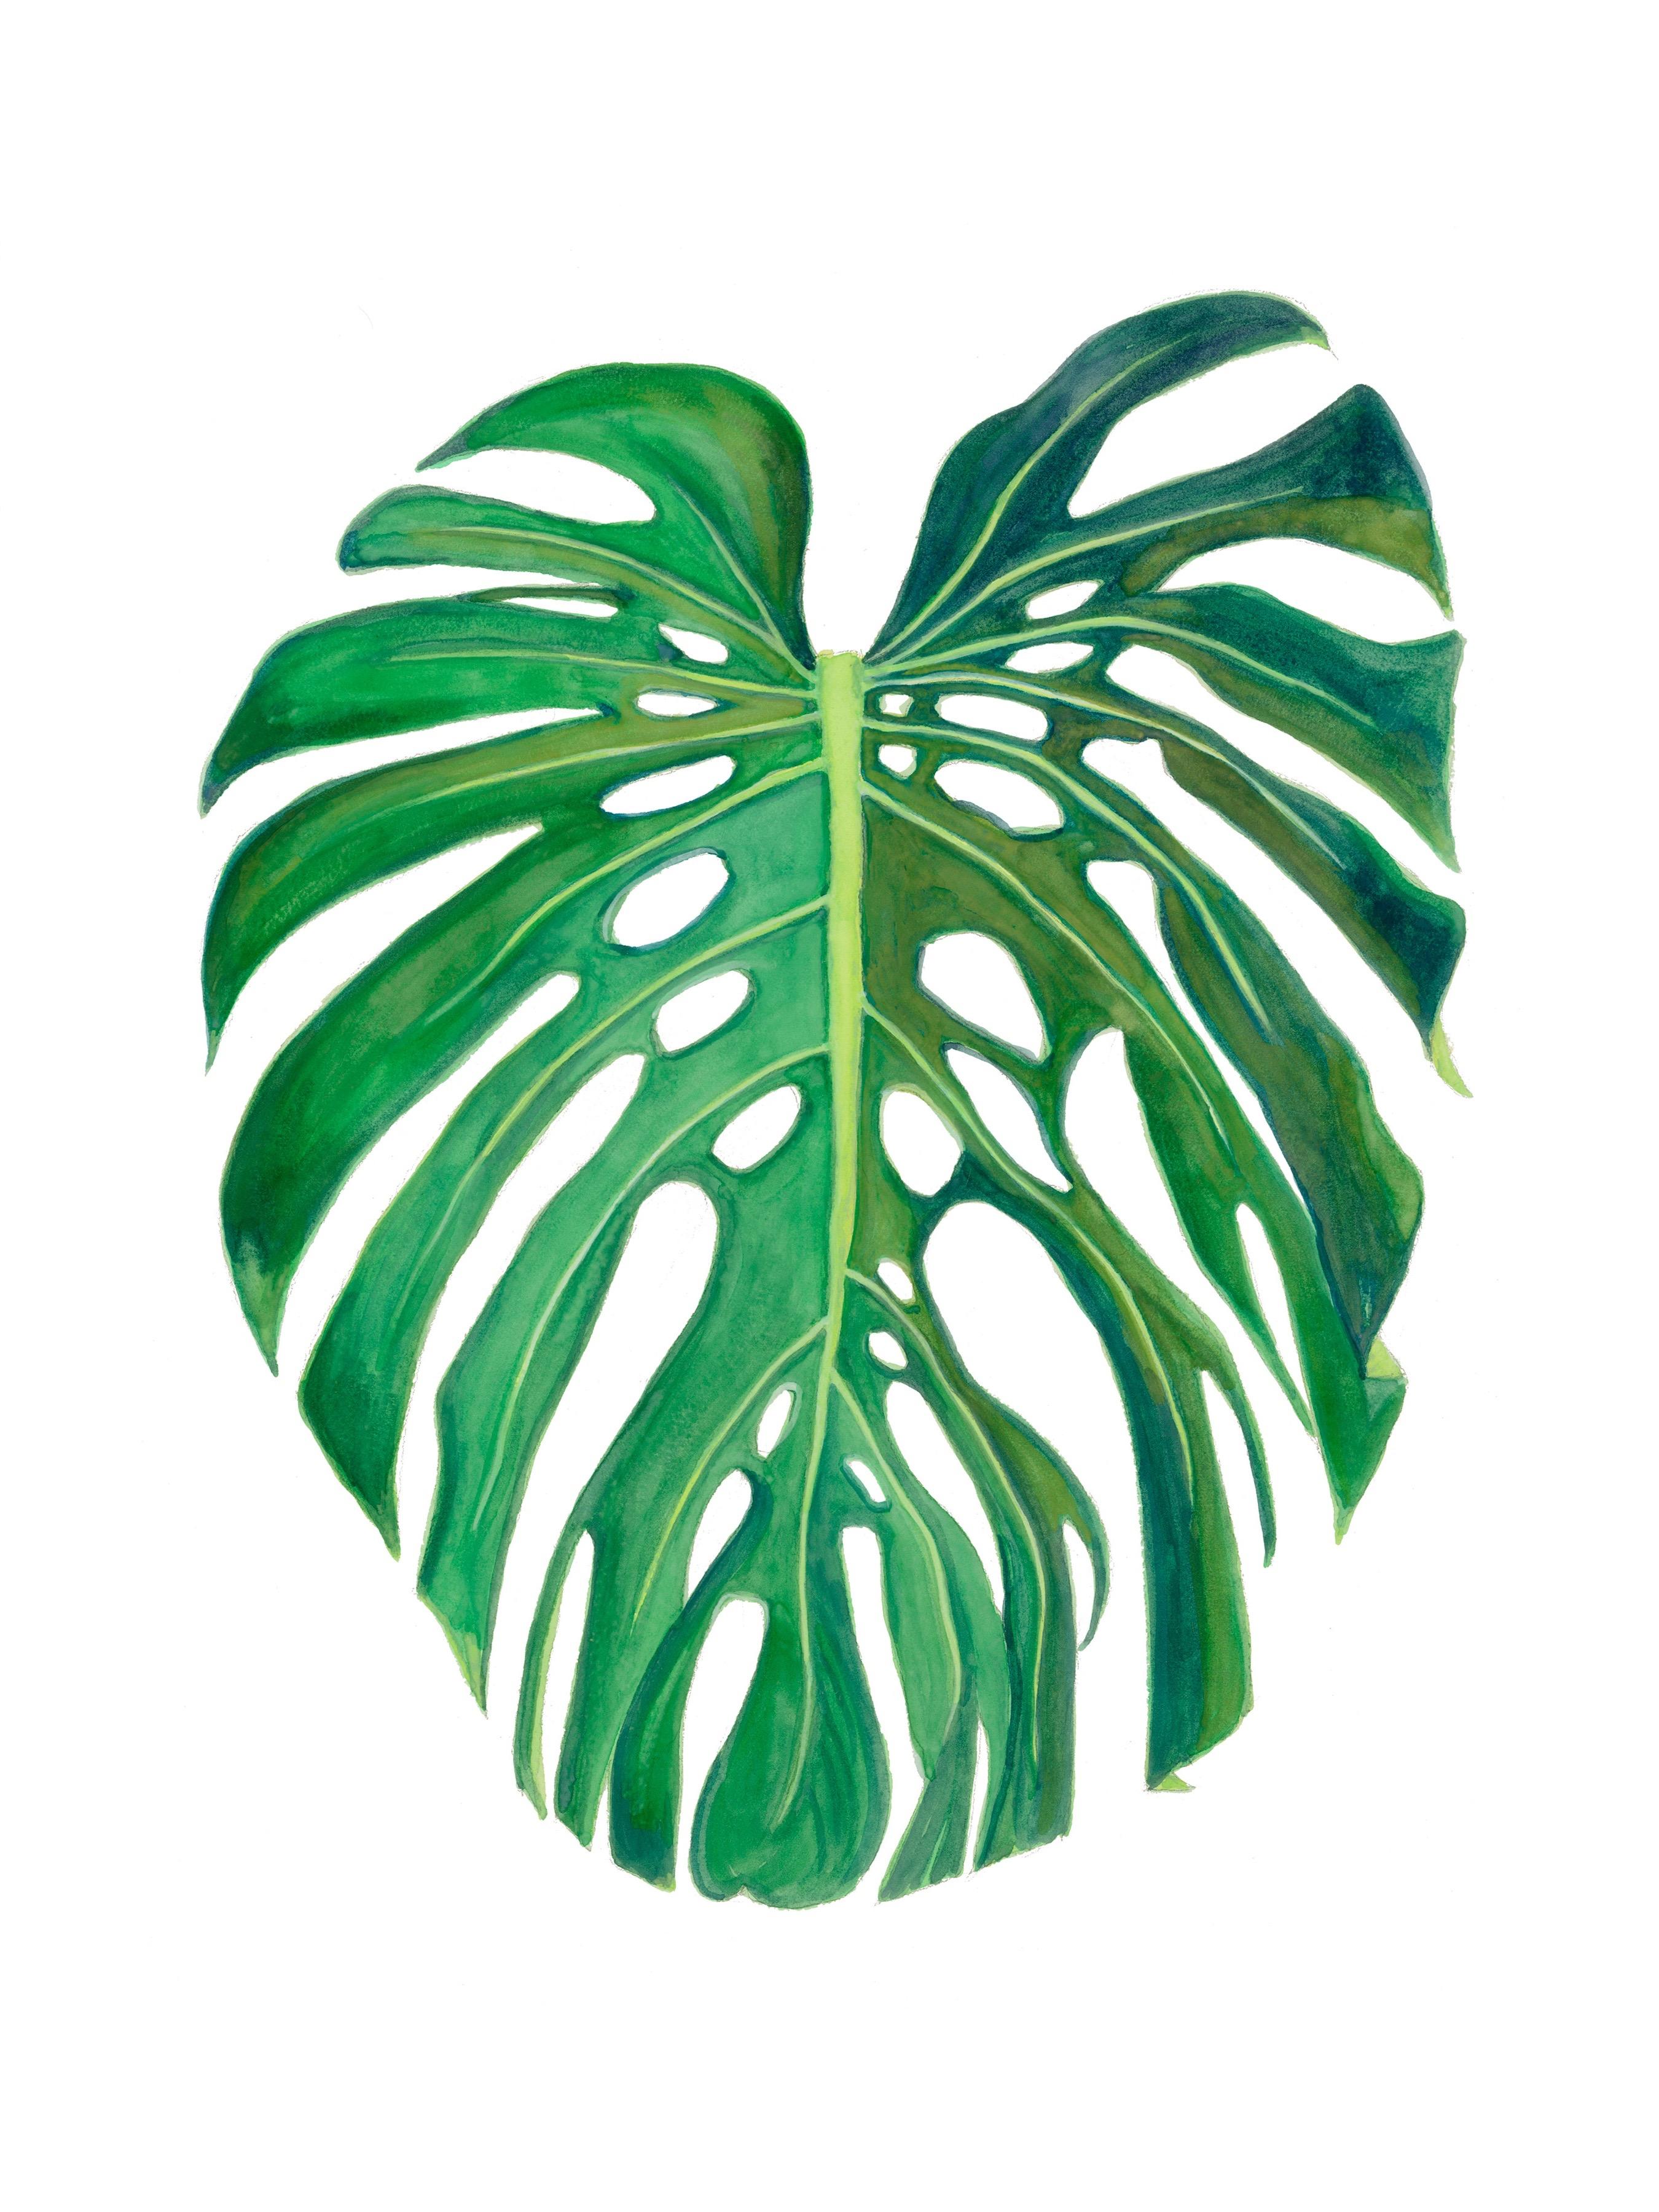 Leaf Monstera Deliciosa Mac Art Galleries